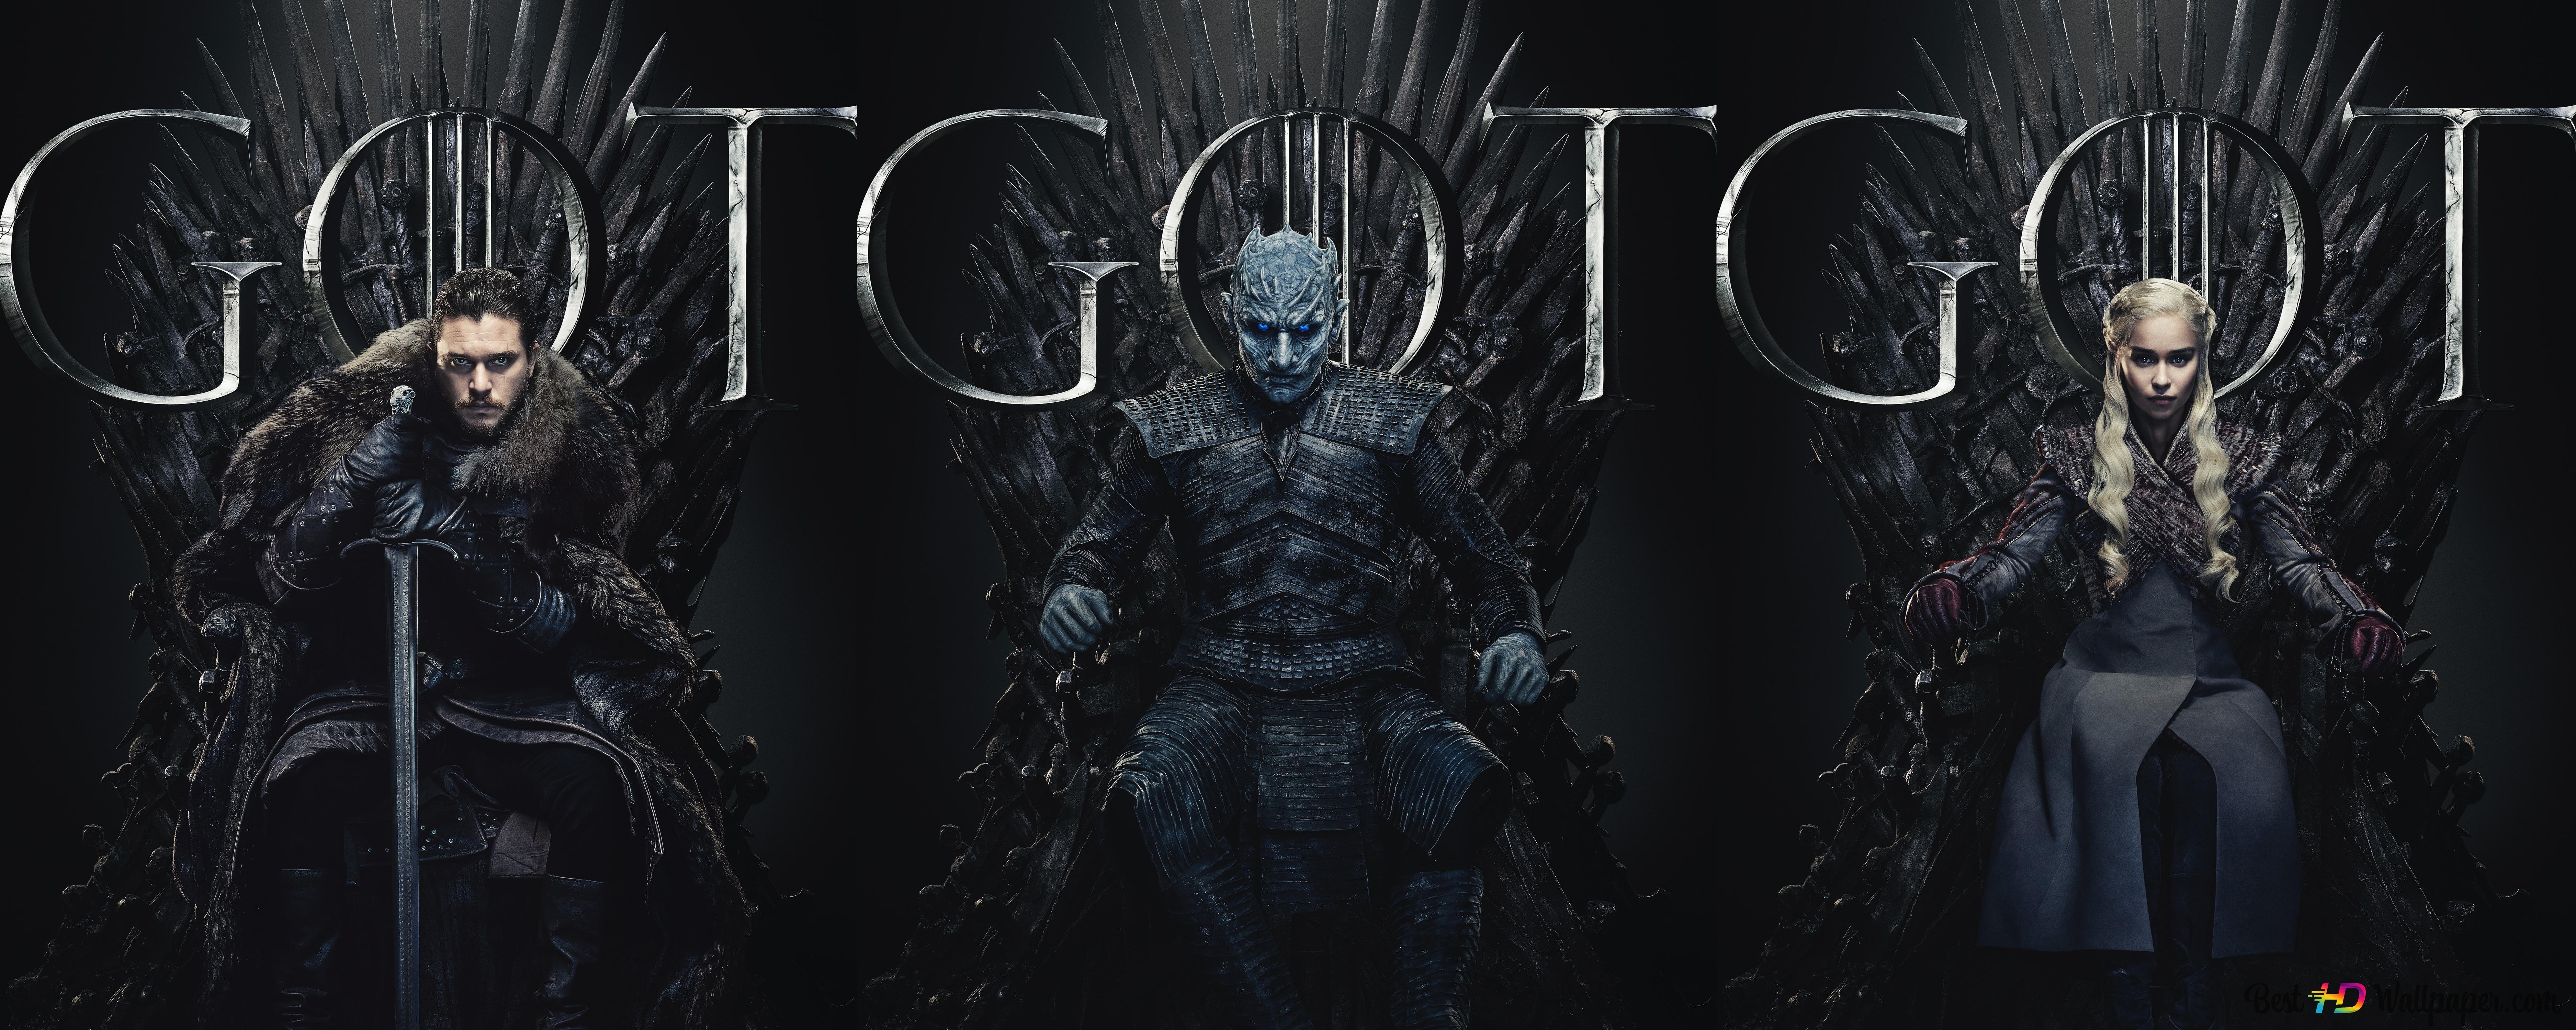 Game Of Thrones Season 8 Hd Wallpaper Download